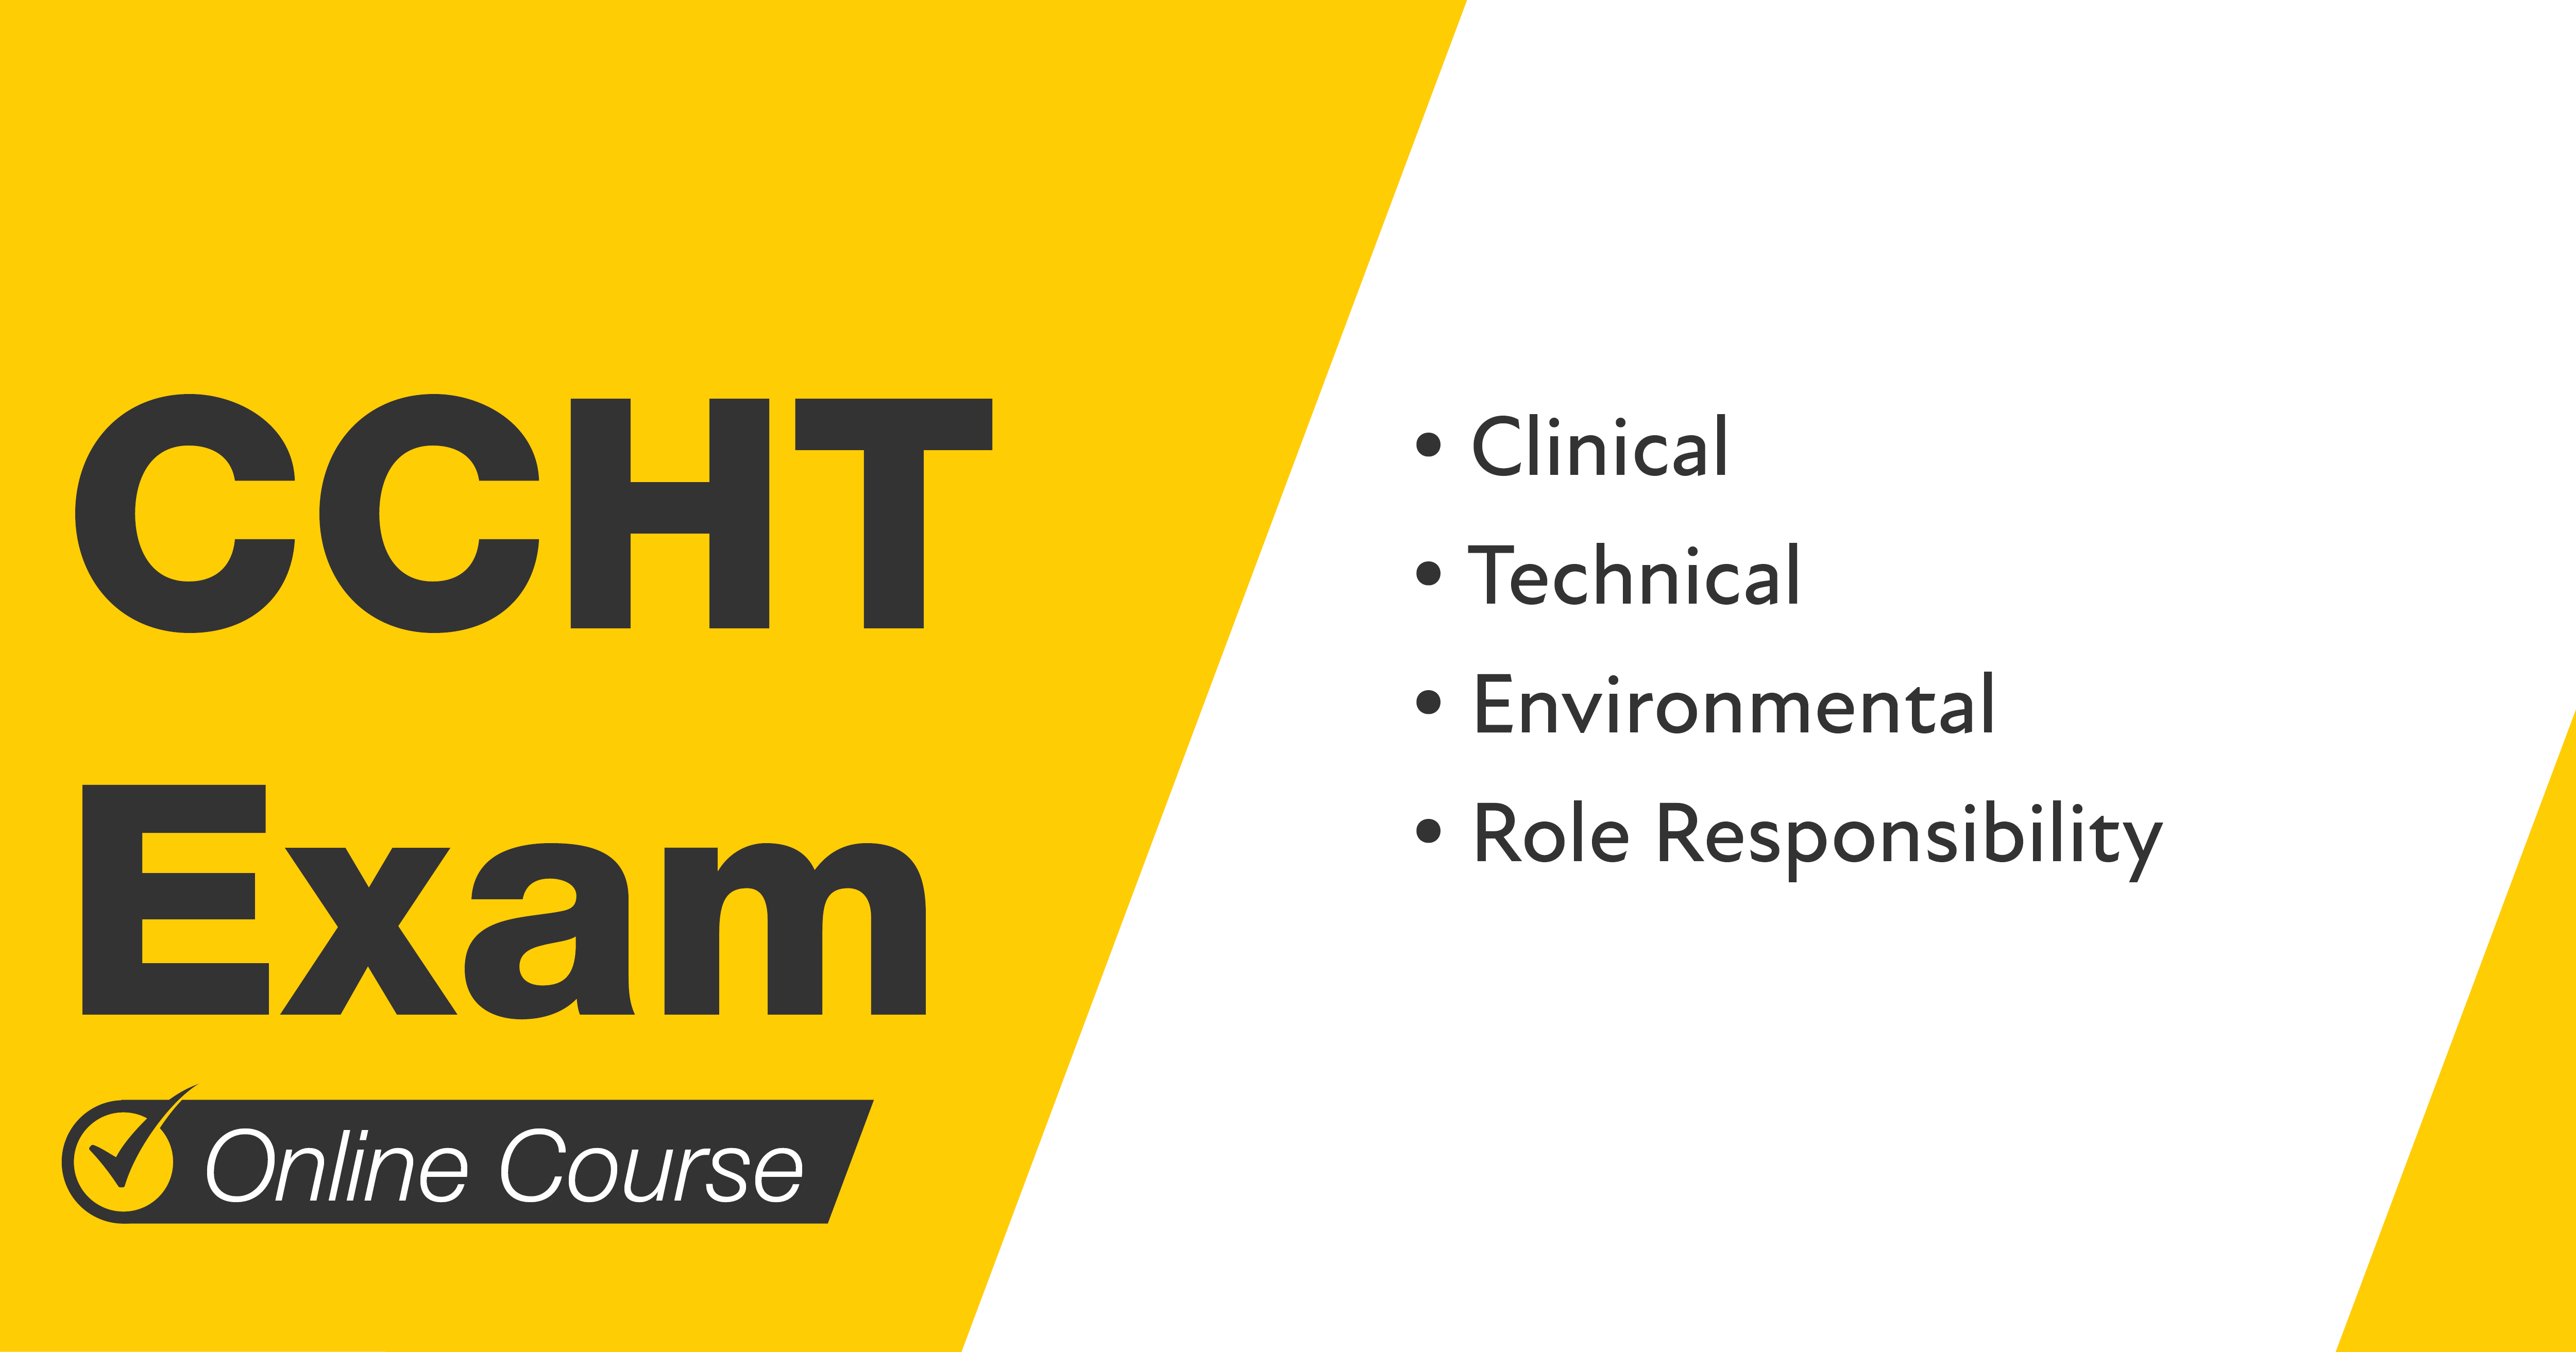 Mometrix CCHT Exam Course